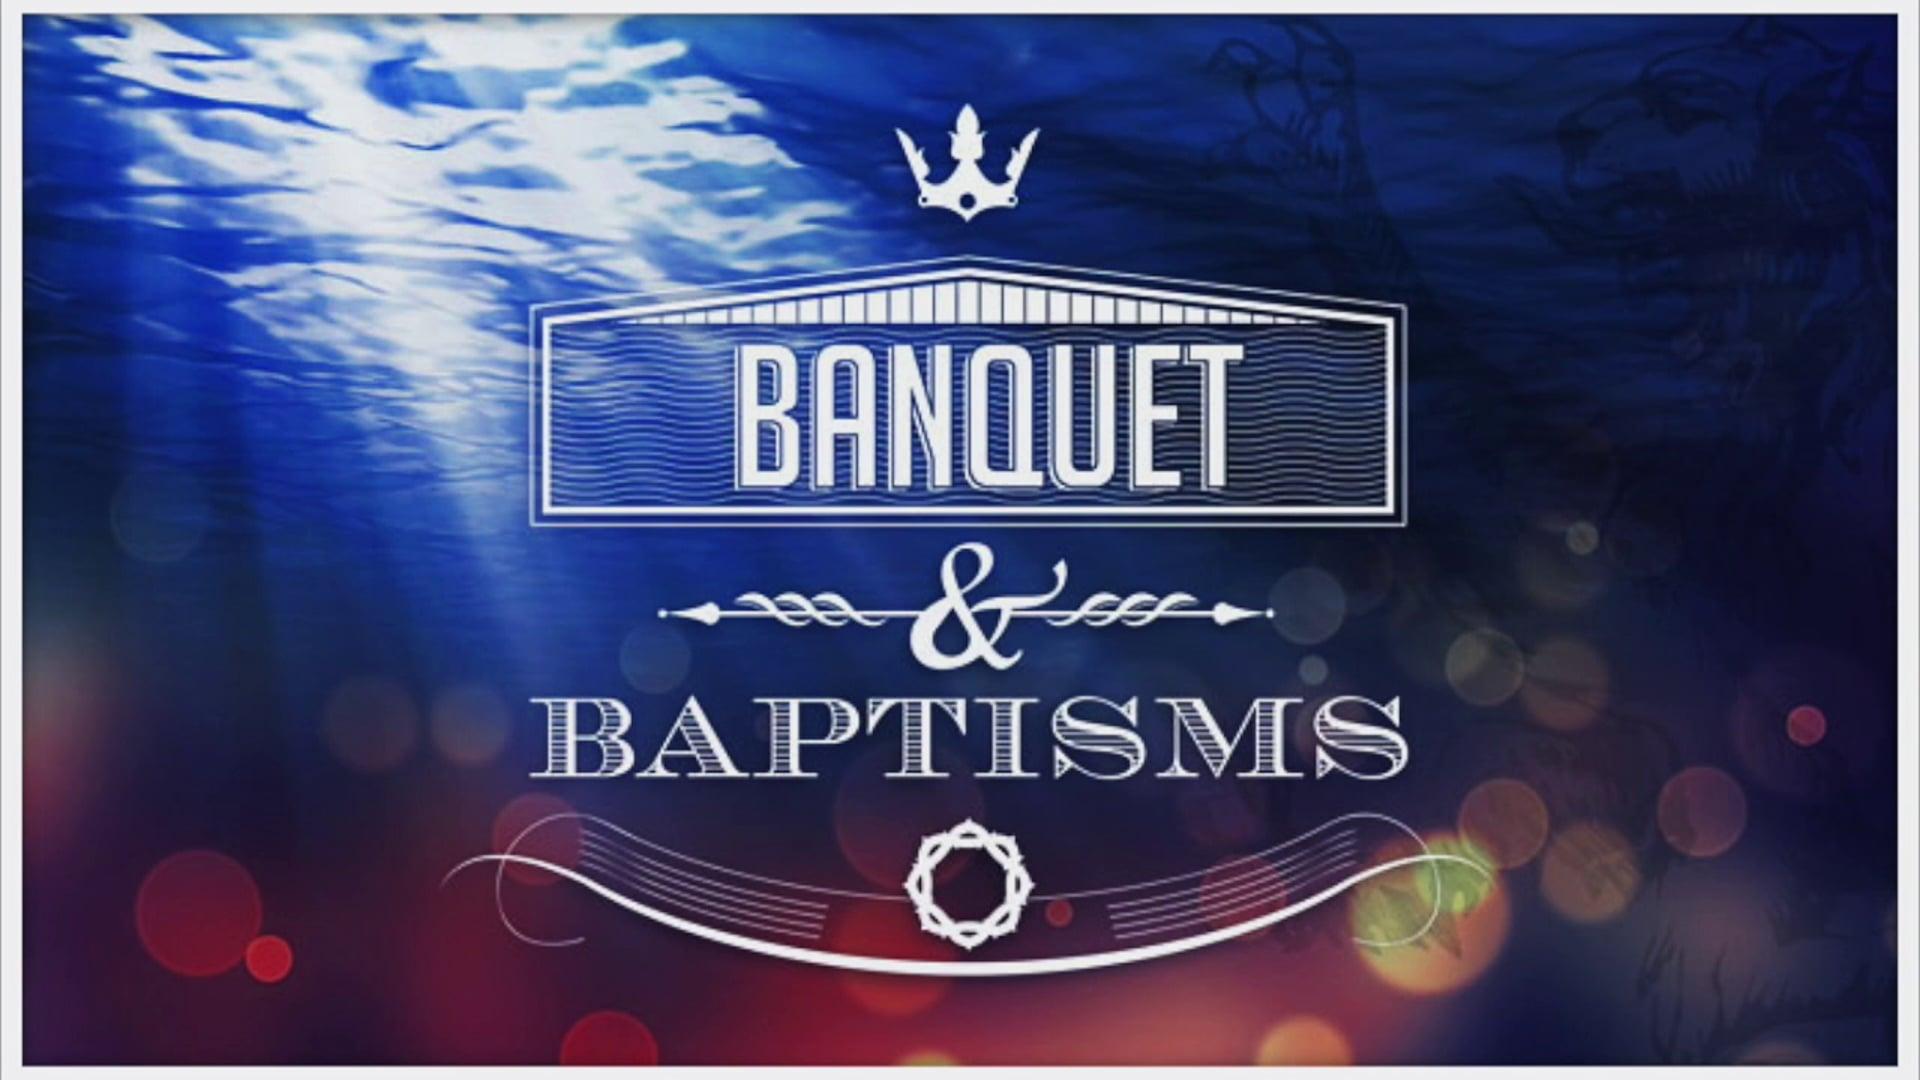 Banquet & Baptisms 26th October 2014